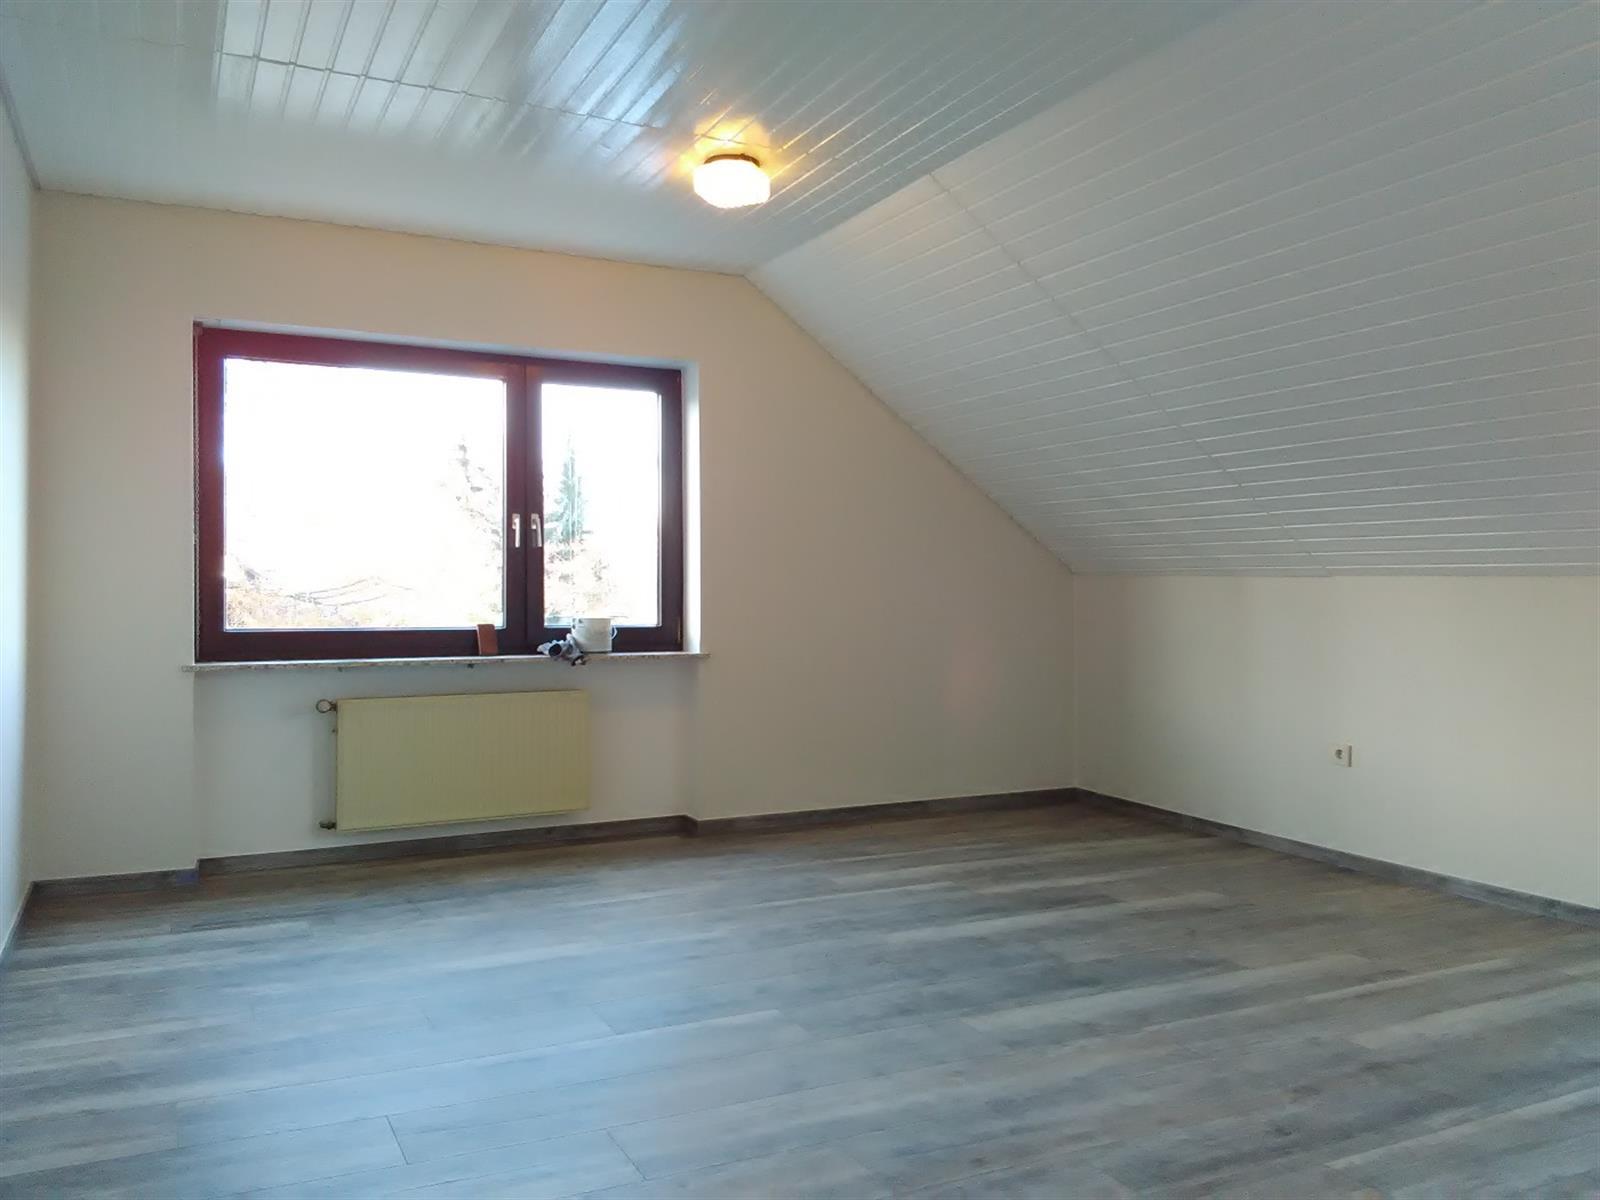 peinture orange paints painting services building editus. Black Bedroom Furniture Sets. Home Design Ideas